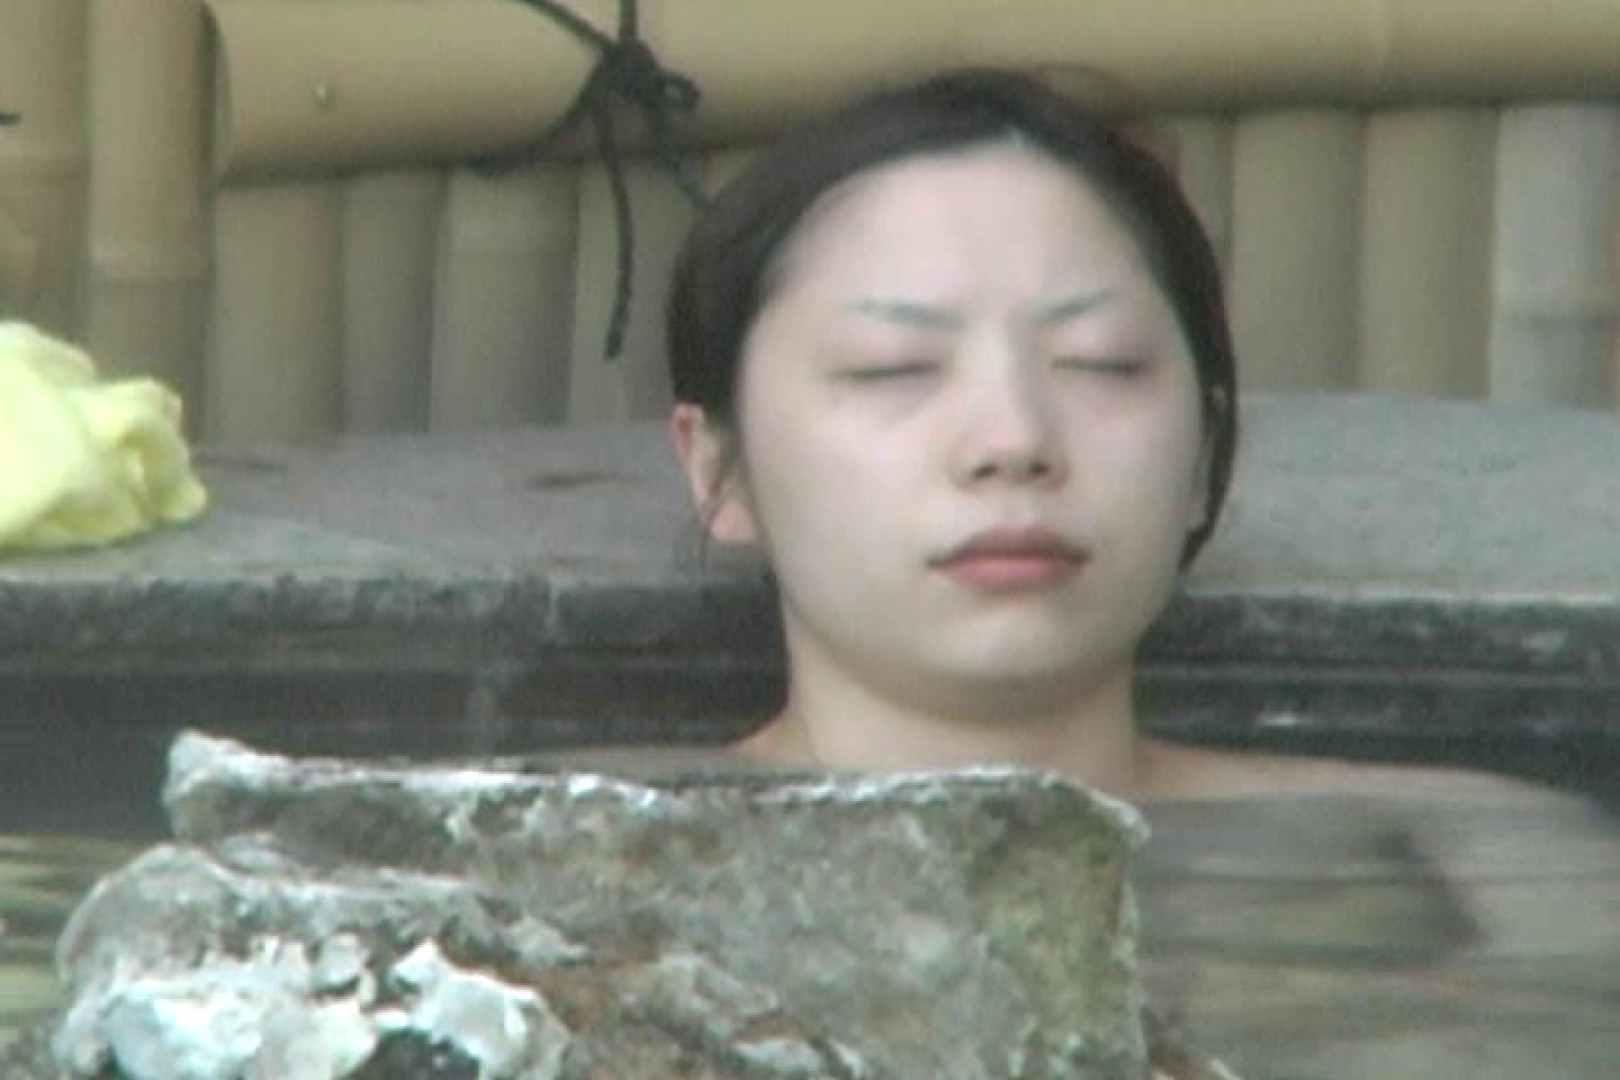 Aquaな露天風呂Vol.596 盗撮シリーズ | 露天風呂編  113PIX 67